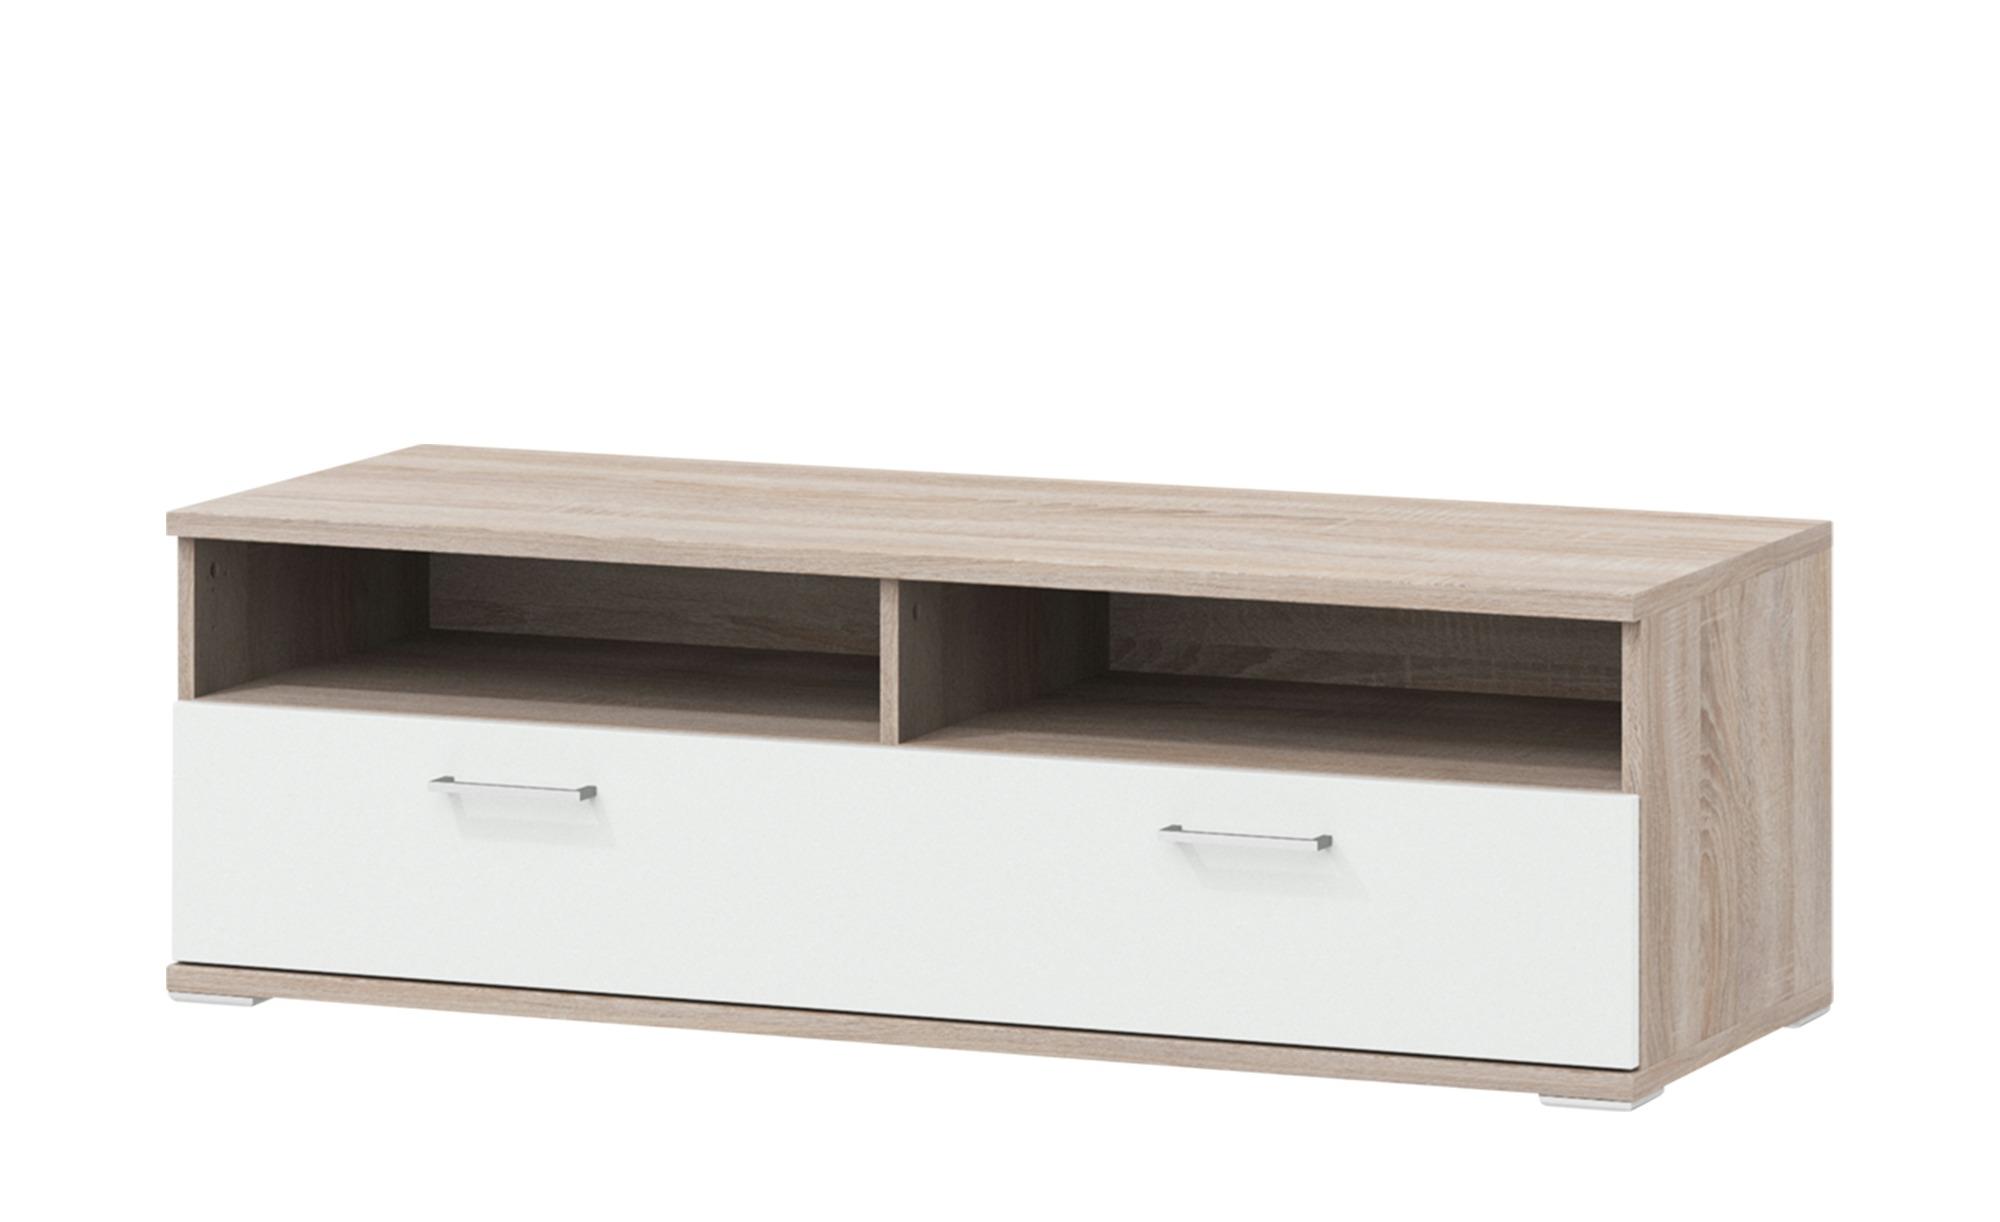 uno Lowboard  Onyx ¦ Maße (cm): B: 130 H: 42 T: 49 Kommoden & Sideboards > Lowboards - Höffner   Wohnzimmer > Schränke > Lowboards   Holzwerkstoff - Holz   Möbel Höffner DE